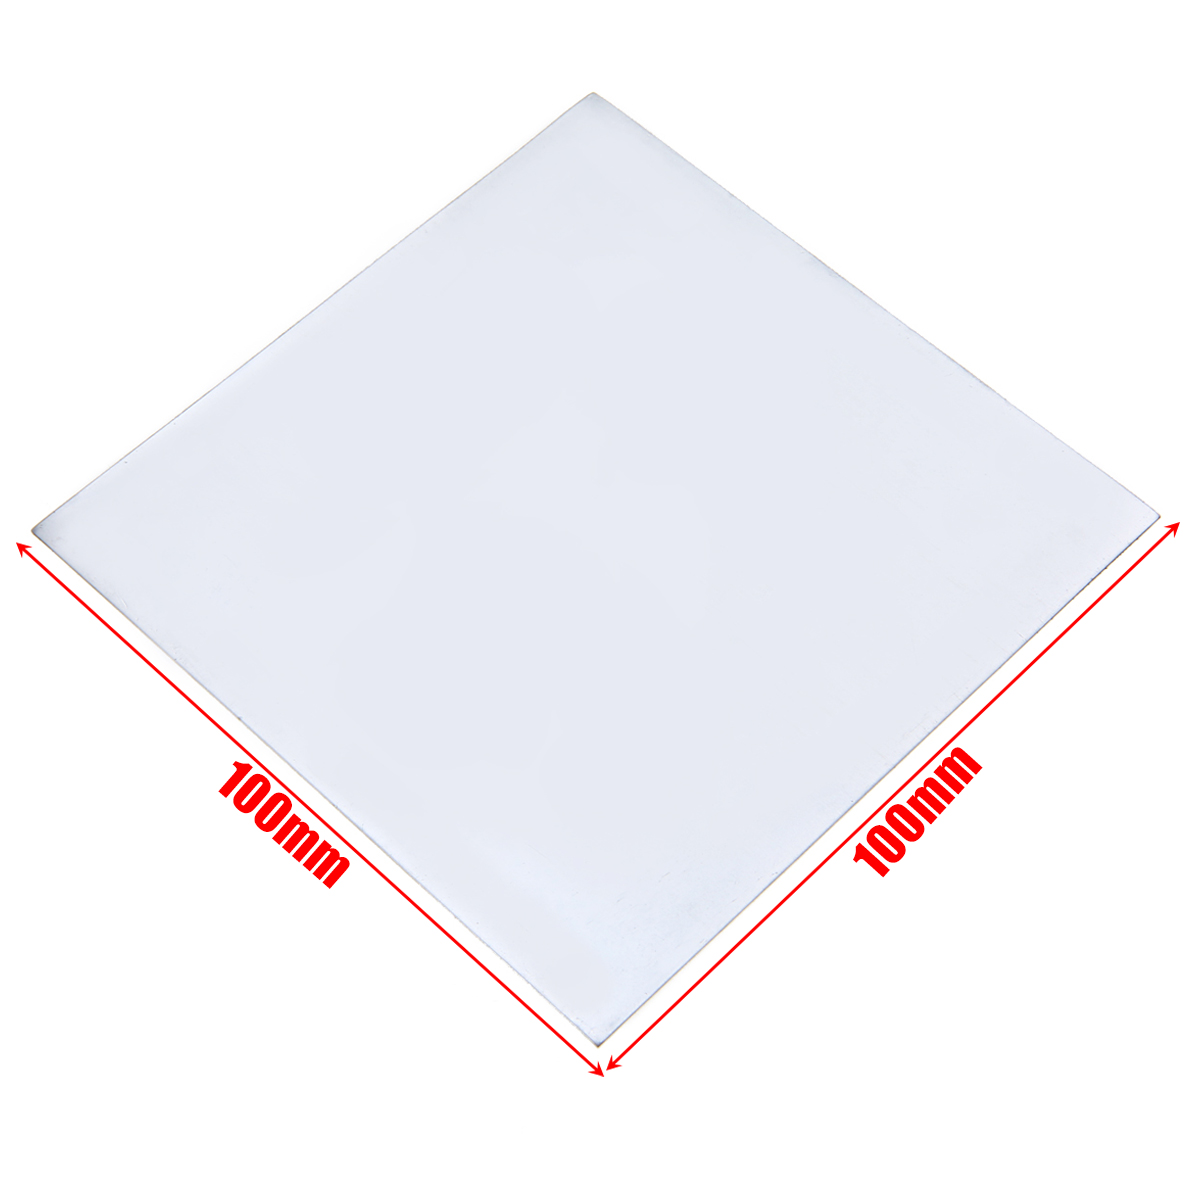 High Purity 99.9/% Pure Zinc Zn Sheet Plate Metal Foil 200mm x 100mm x 0.5mm